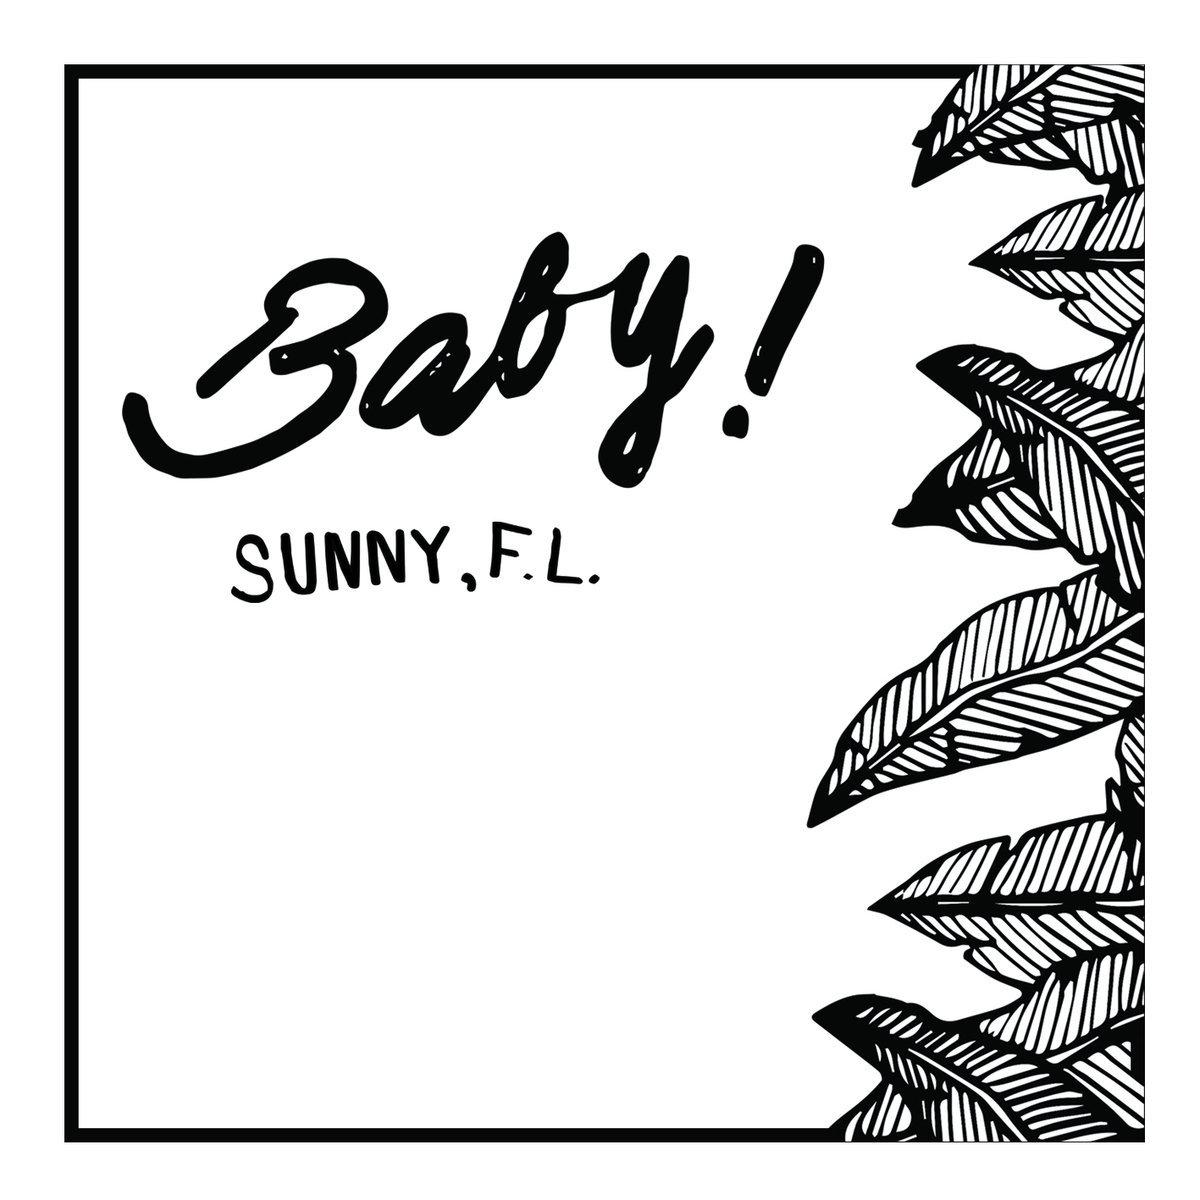 Baby! / Sunny, F.L.(500 Ltd LP)